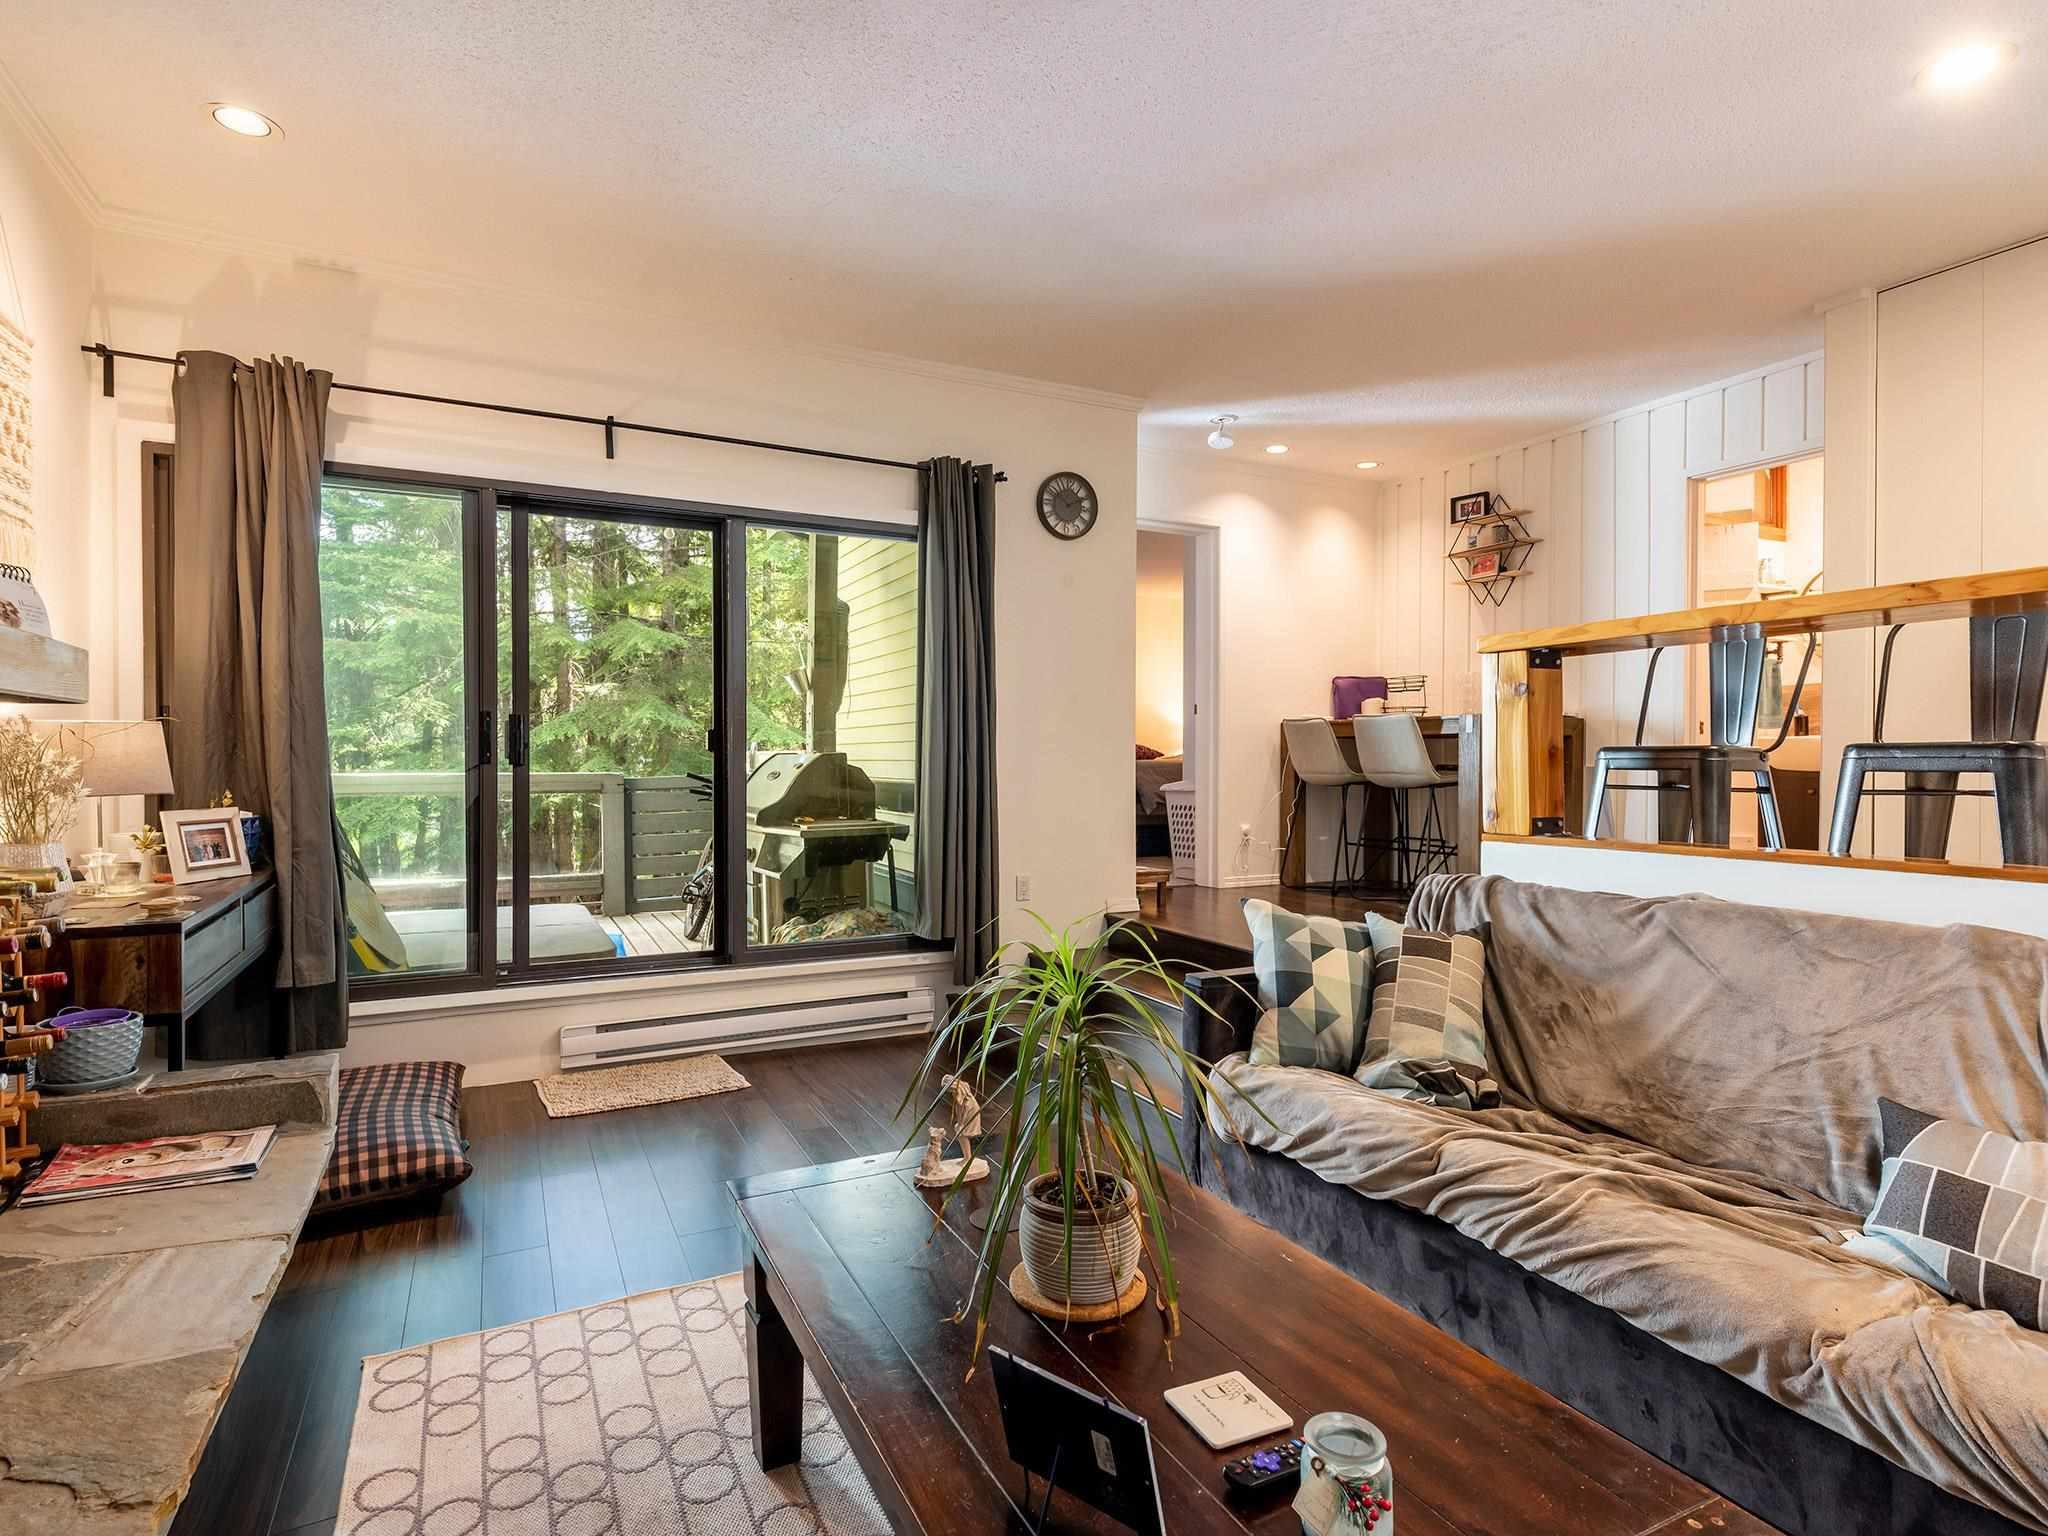 G103 1400 ALTA LAKE ROAD - Whistler Creek Apartment/Condo for sale, 1 Bedroom (R2600918)